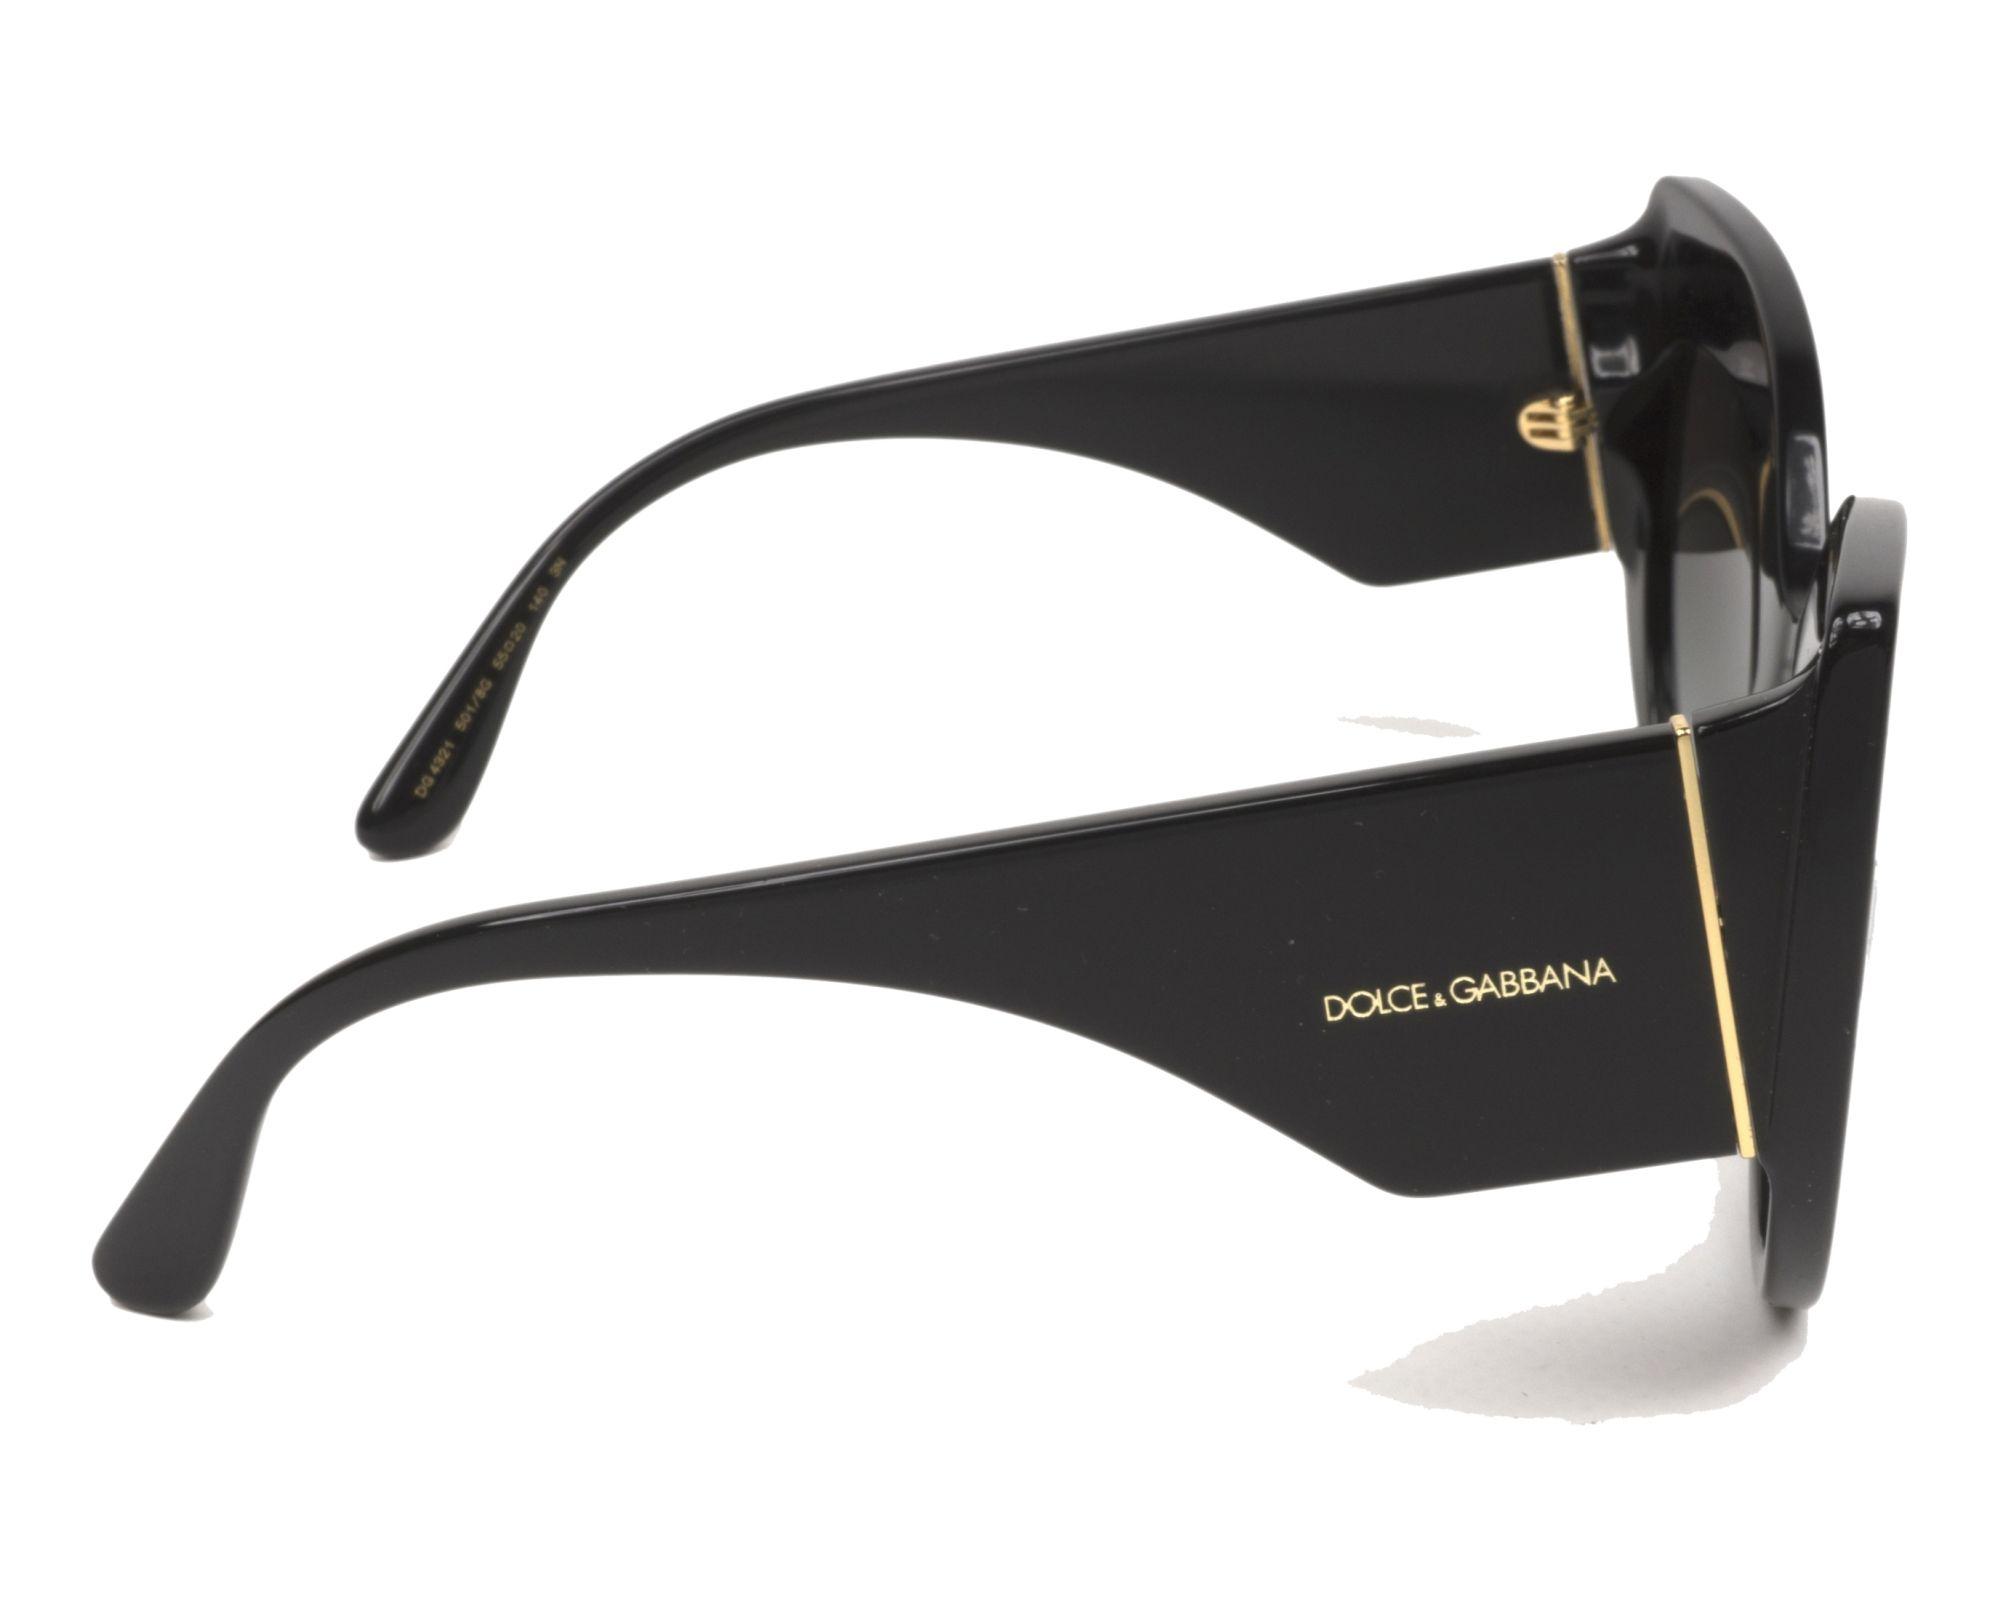 Dolce & Gabbana DG4321 501/8G 55-20 ybBkjHn0hg